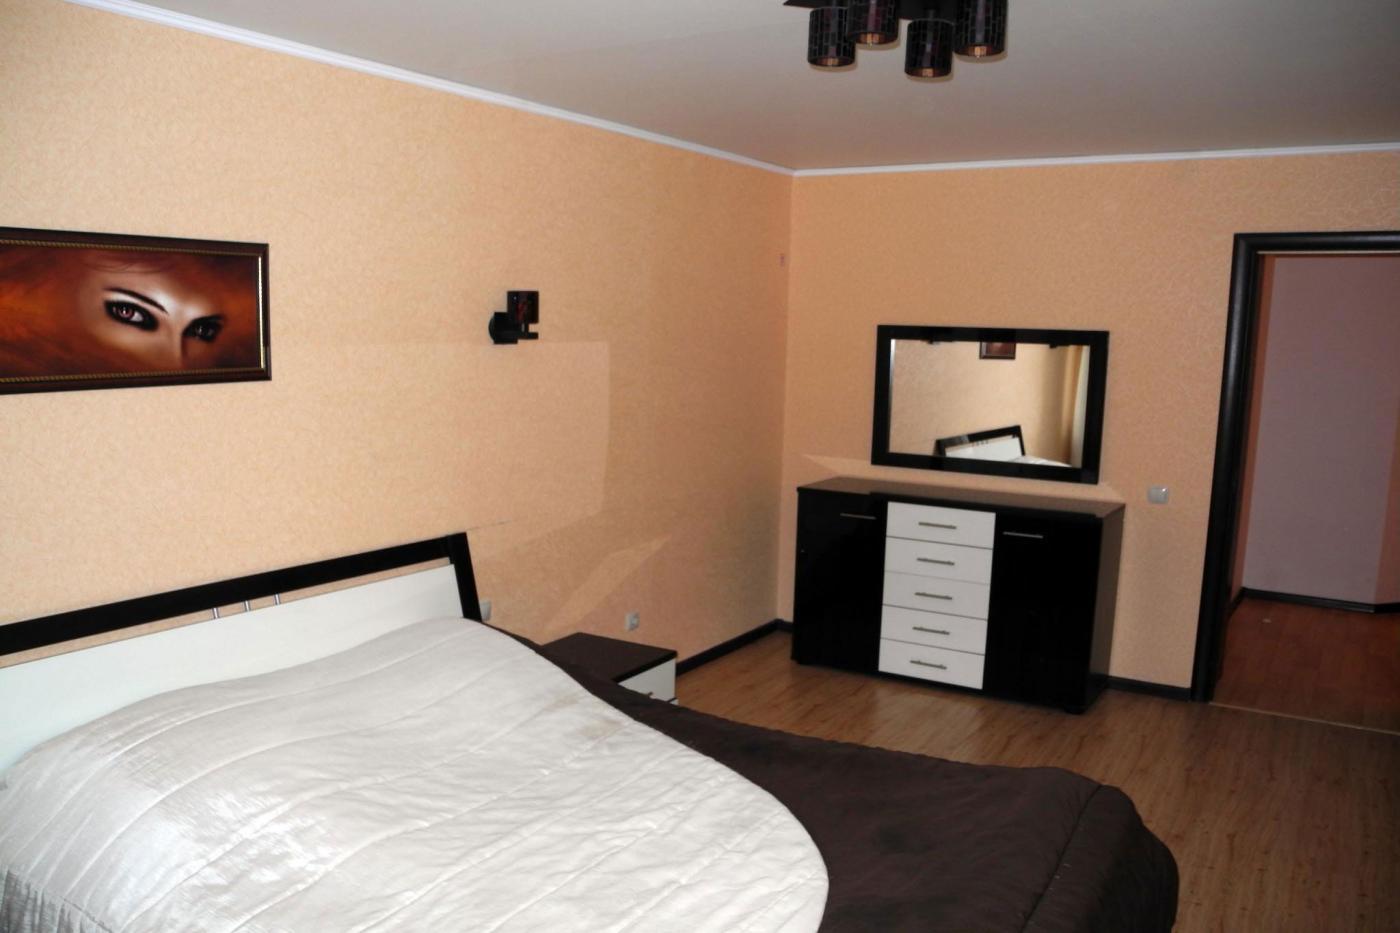 2-комнатная квартира посуточно (вариант № 3876), ул. Войкова улица, фото № 8